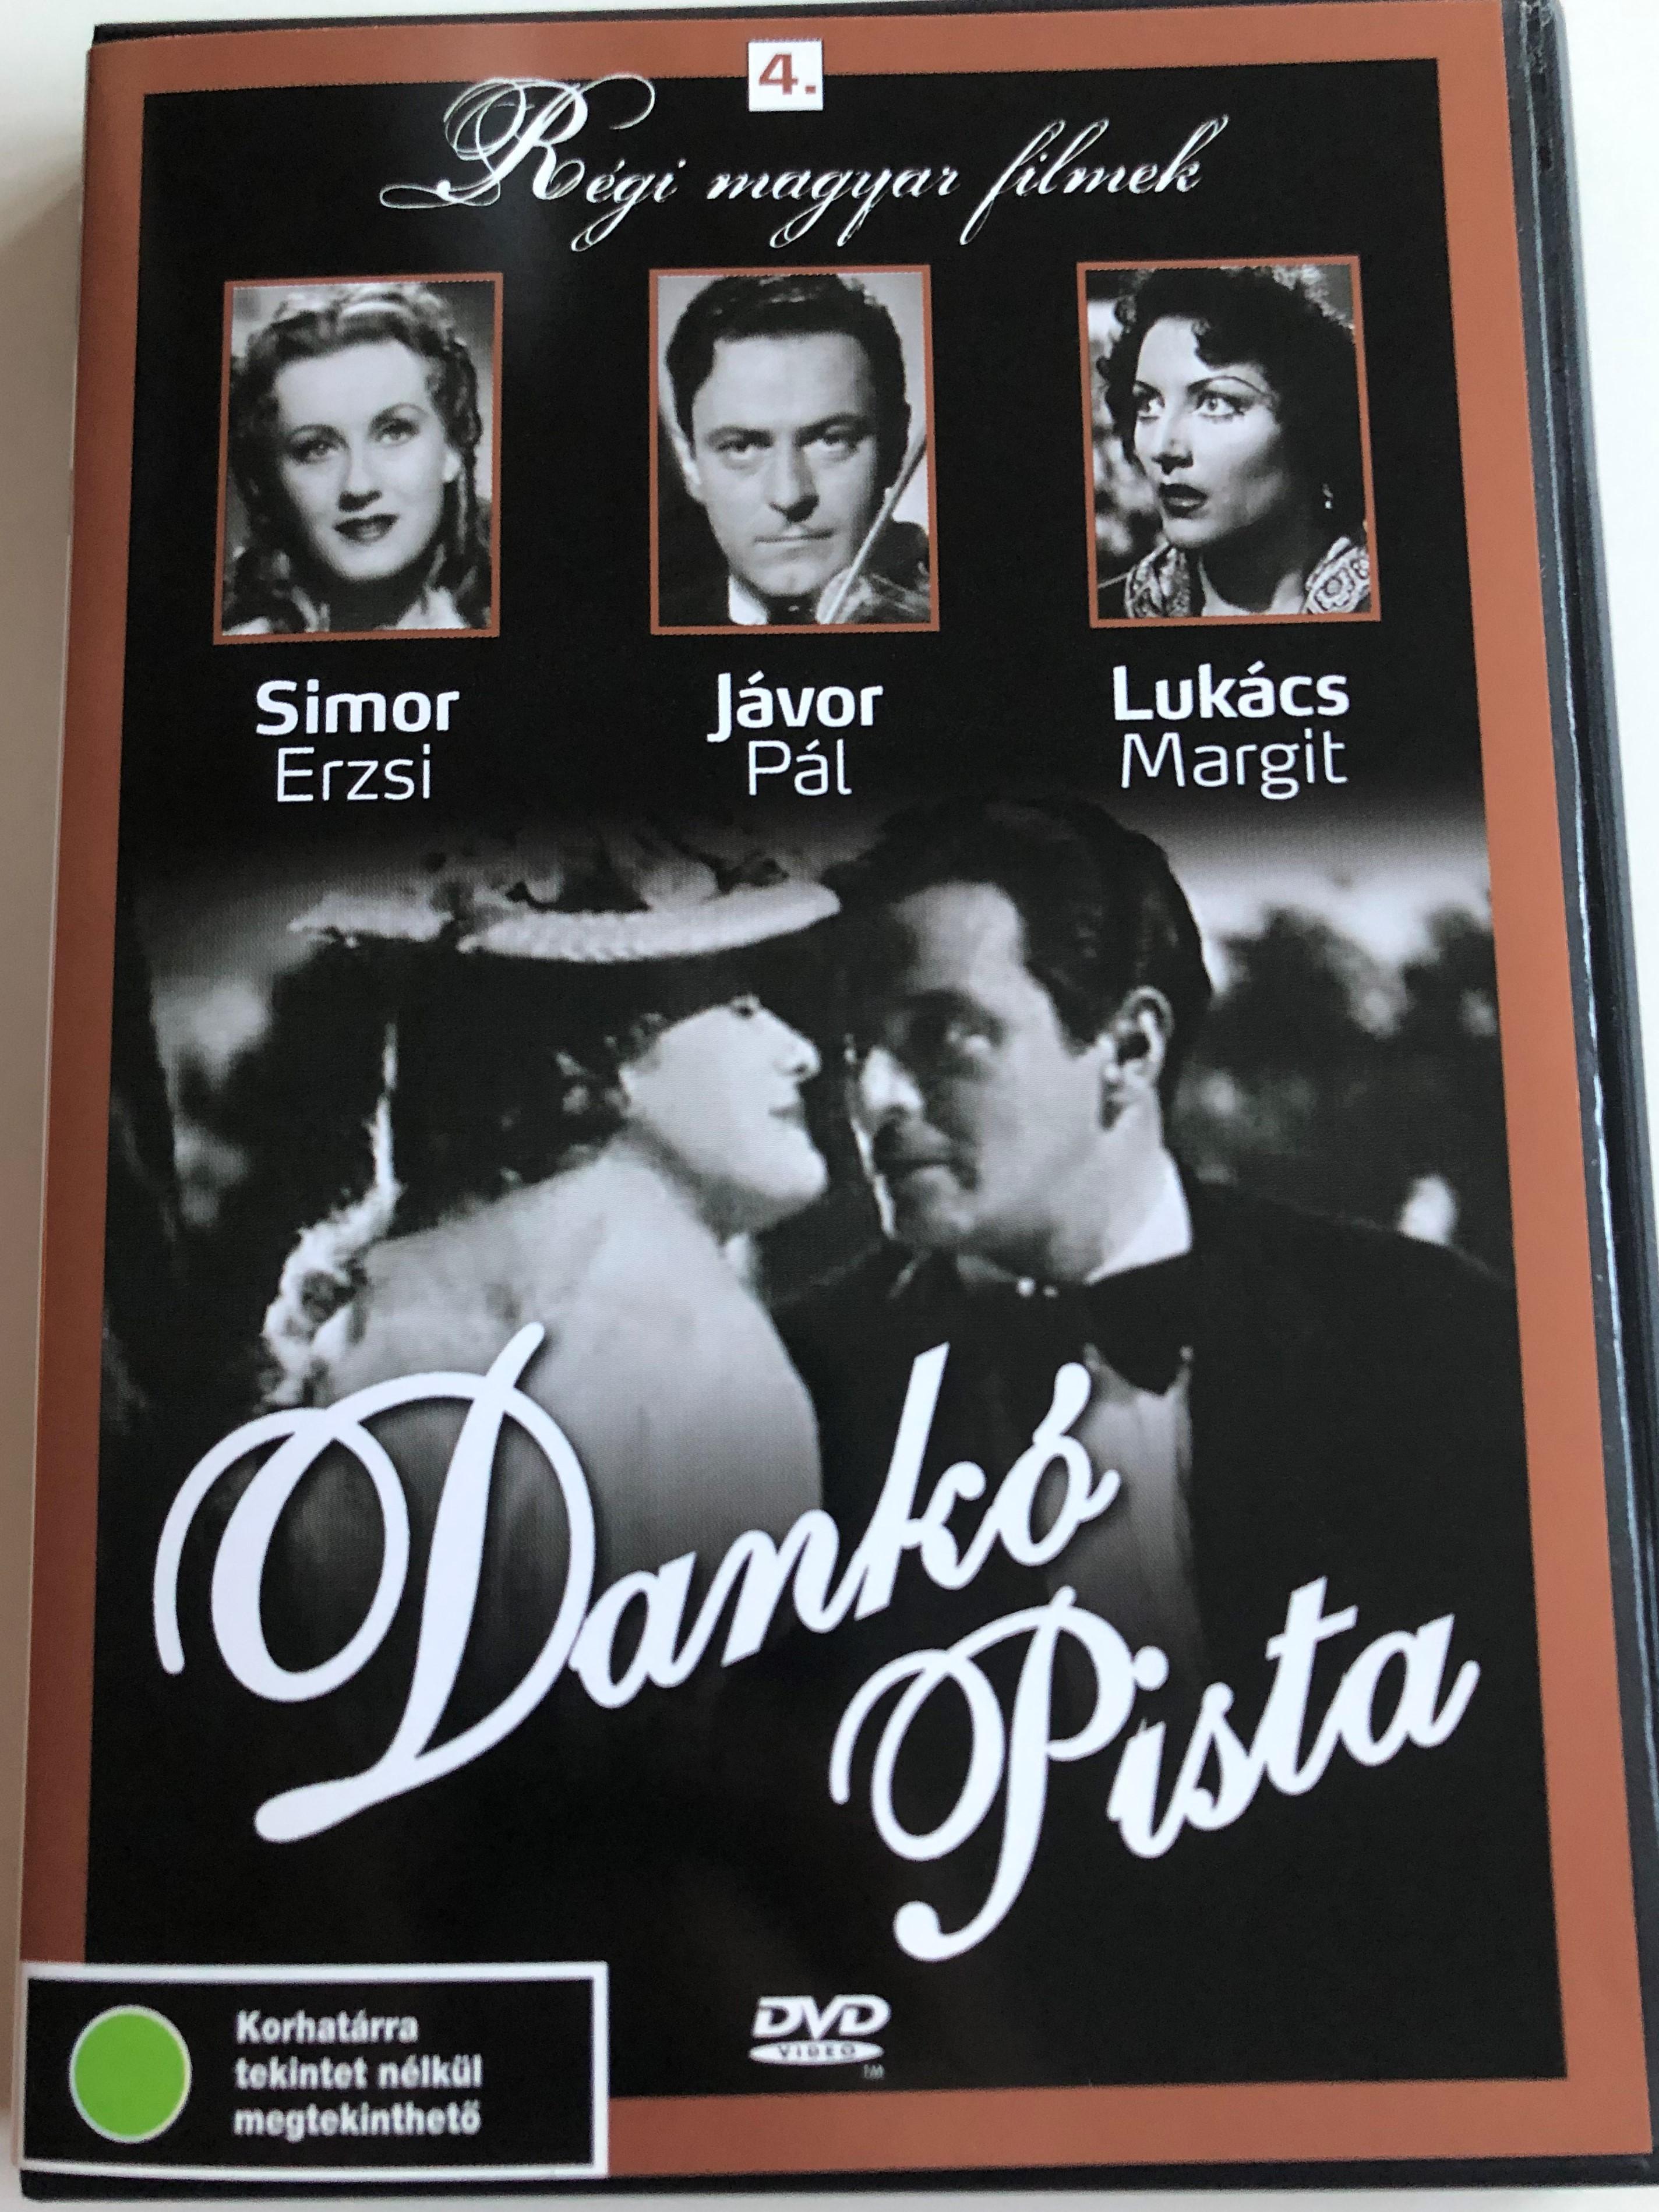 dank-pista-dvd-1940-directed-by-kalm-r-l-szl-1.jpg